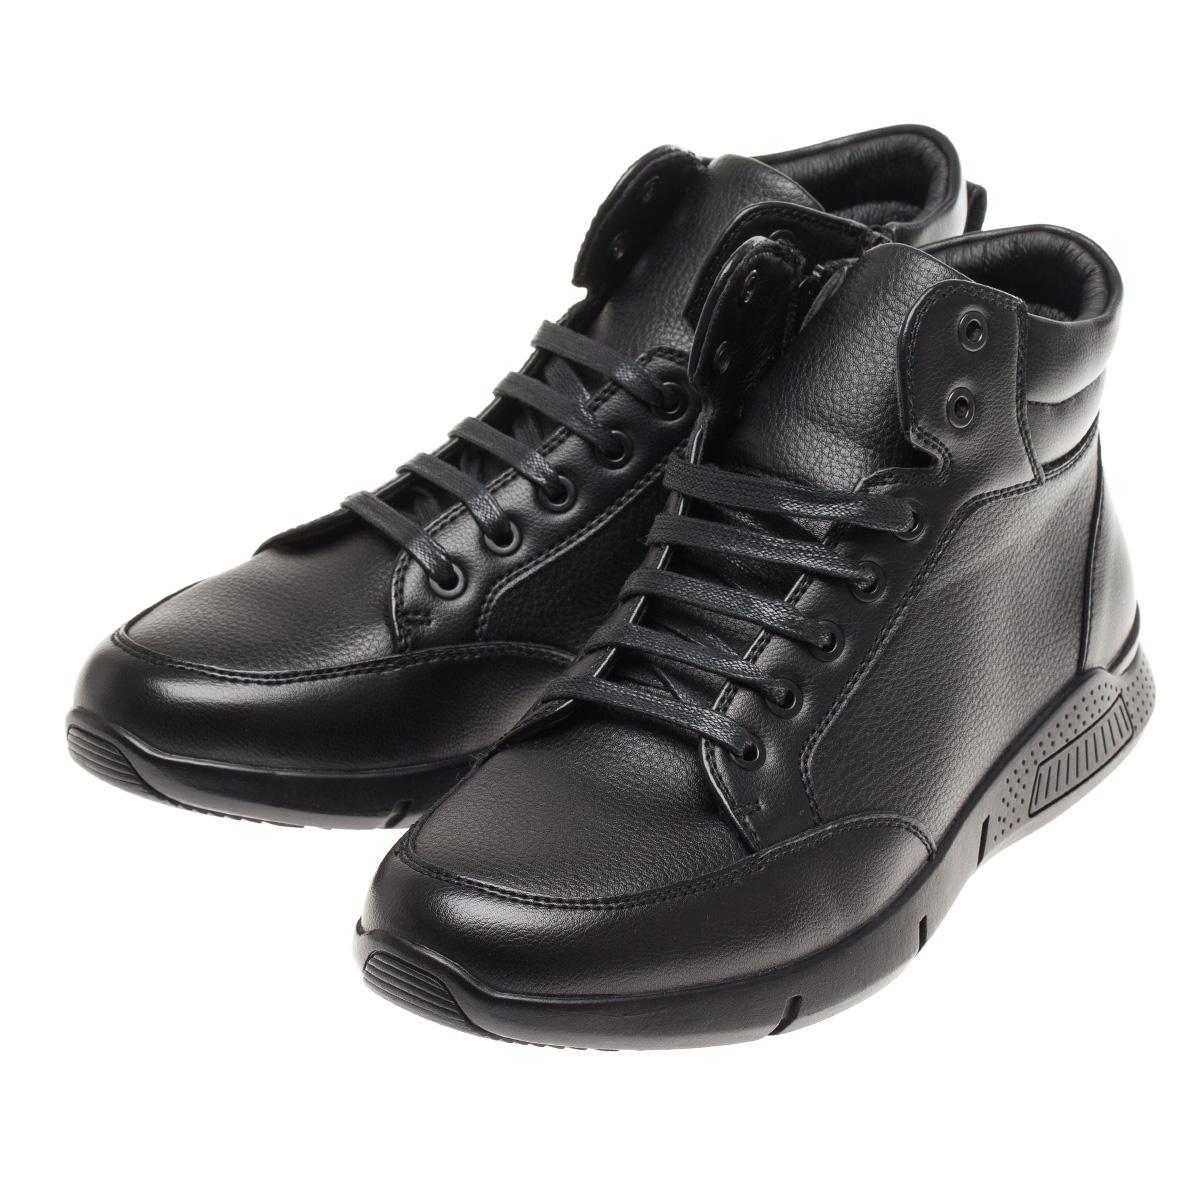 Ботинки демисезонные FERTO, M1815-2